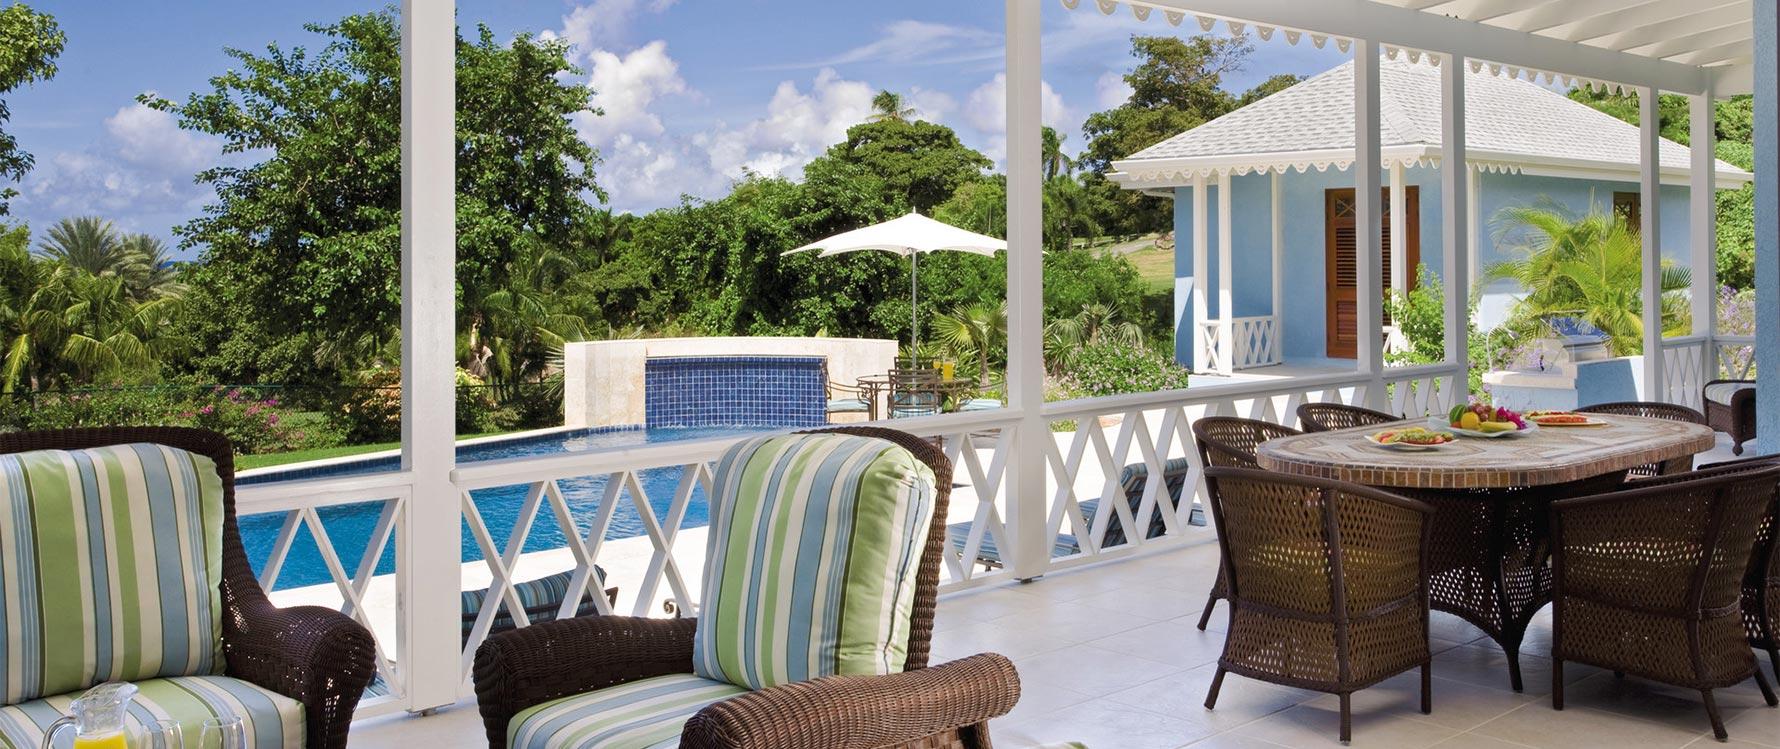 View from veranda / lounge area